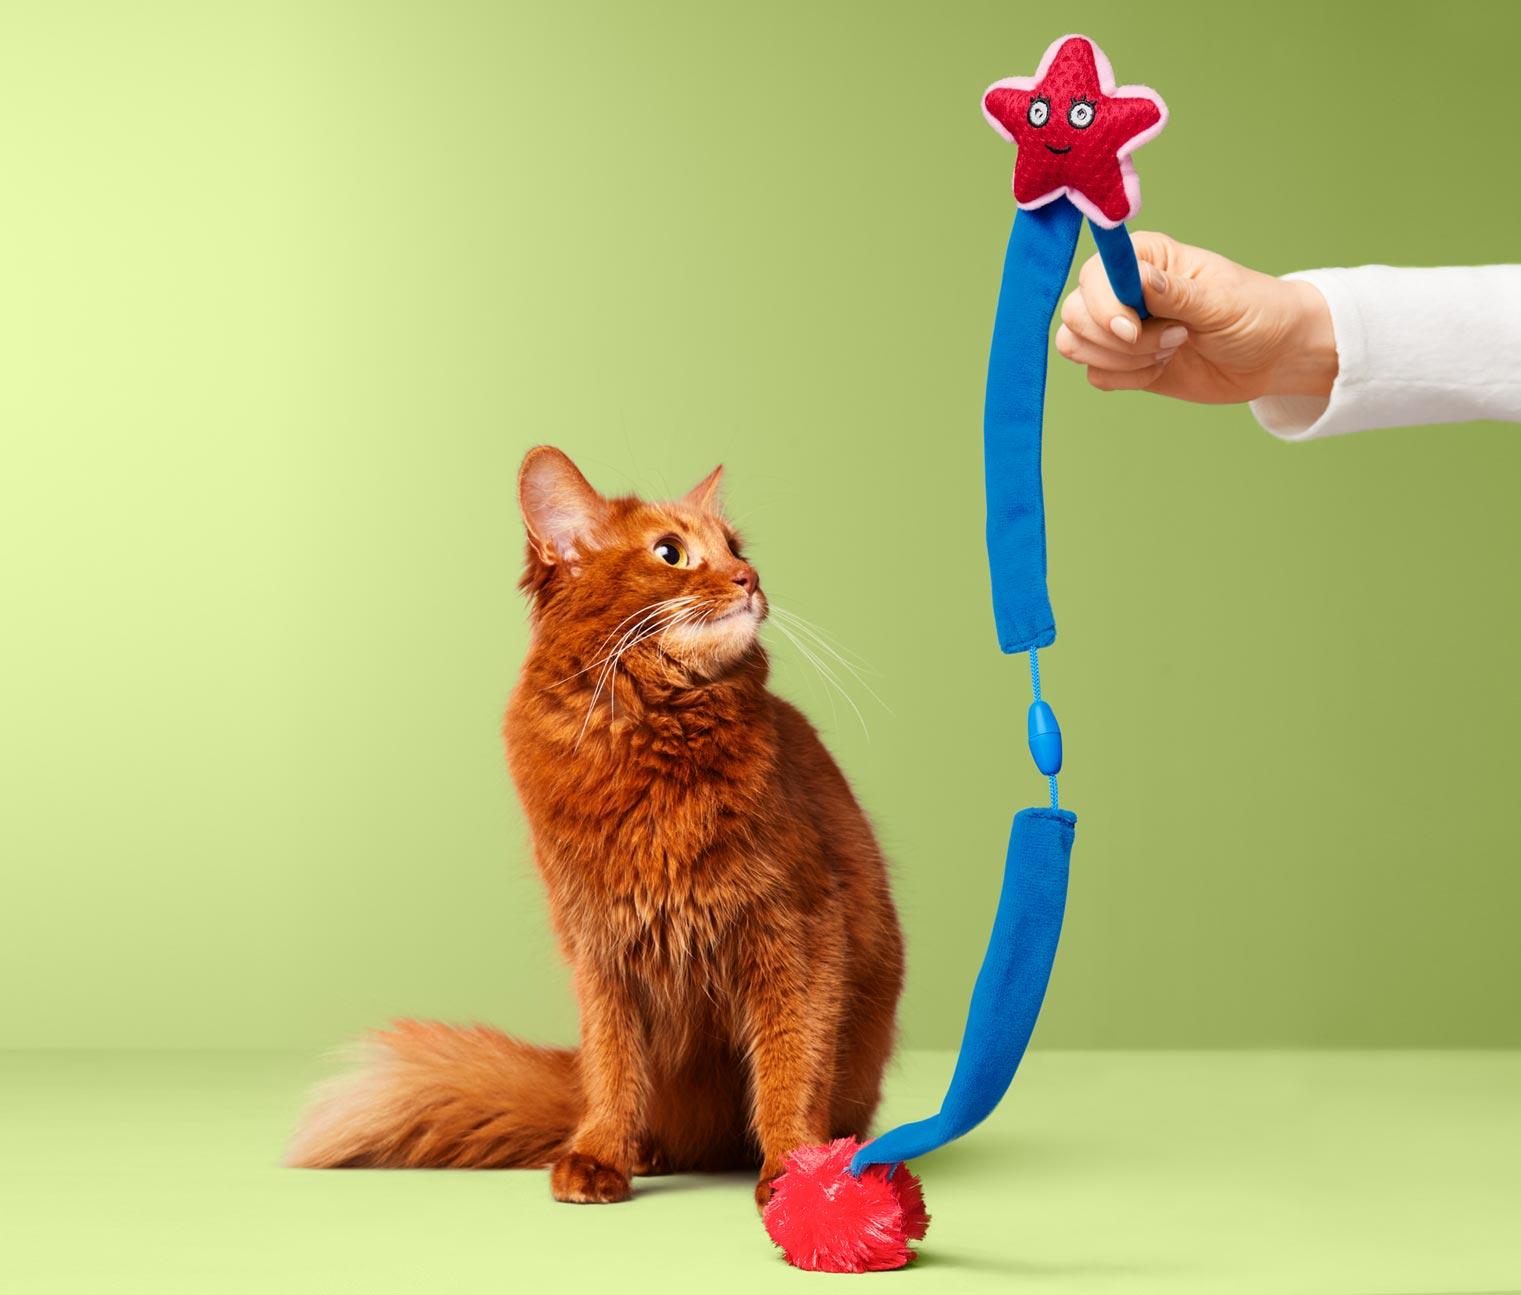 Image of Katzen-Spielzeug